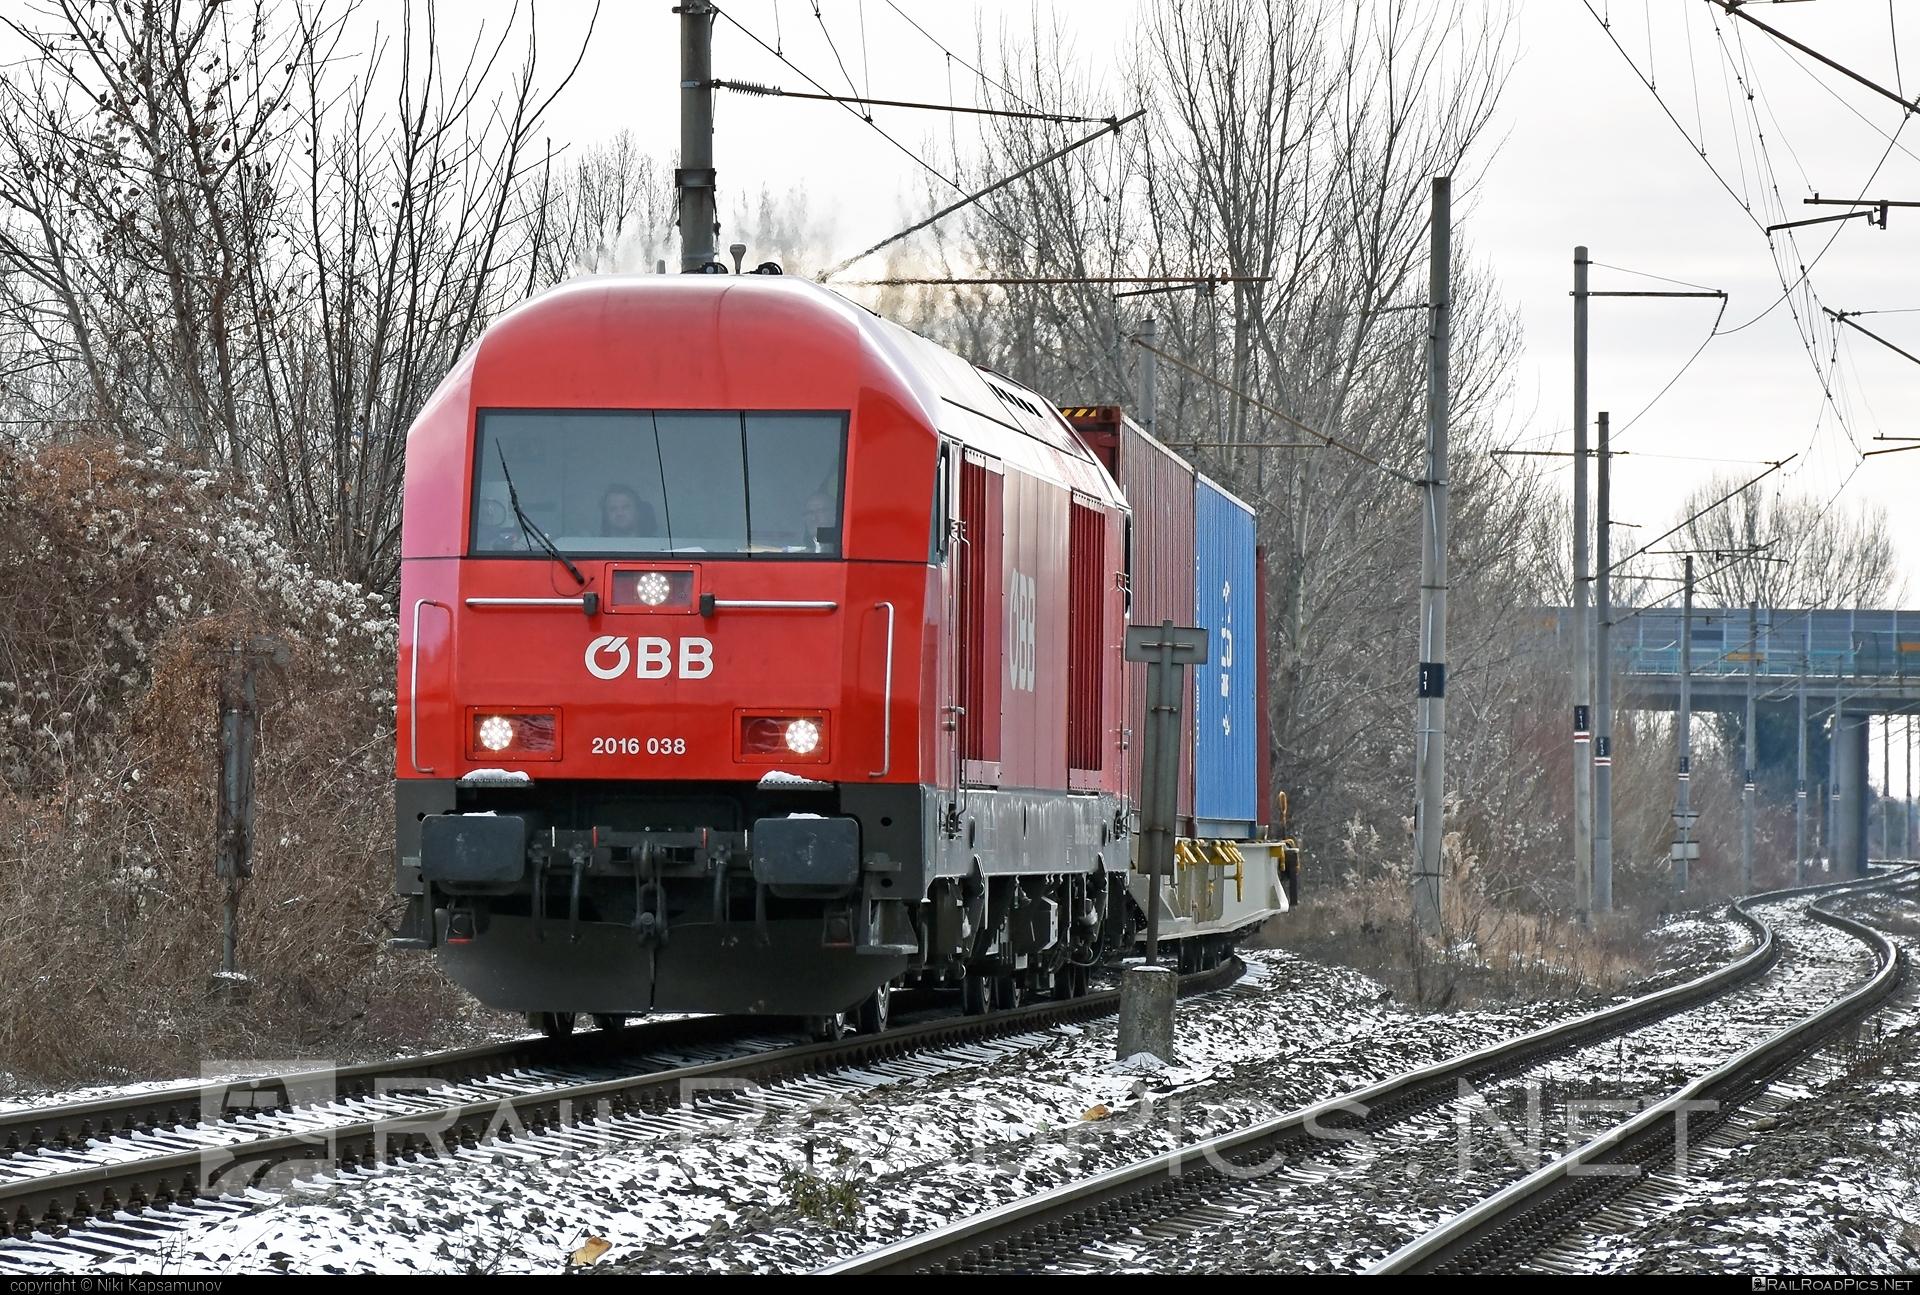 Siemens ER20 - 2016 038 operated by Rail Cargo Carrier – Slovakia s.r.o. #er20 #er20hercules #eurorunner #flatwagon #hercules #obb #osterreichischebundesbahnen #rccsk #siemens #siemenser20 #siemenser20hercules #siemenseurorunner #siemenshercules #wssk